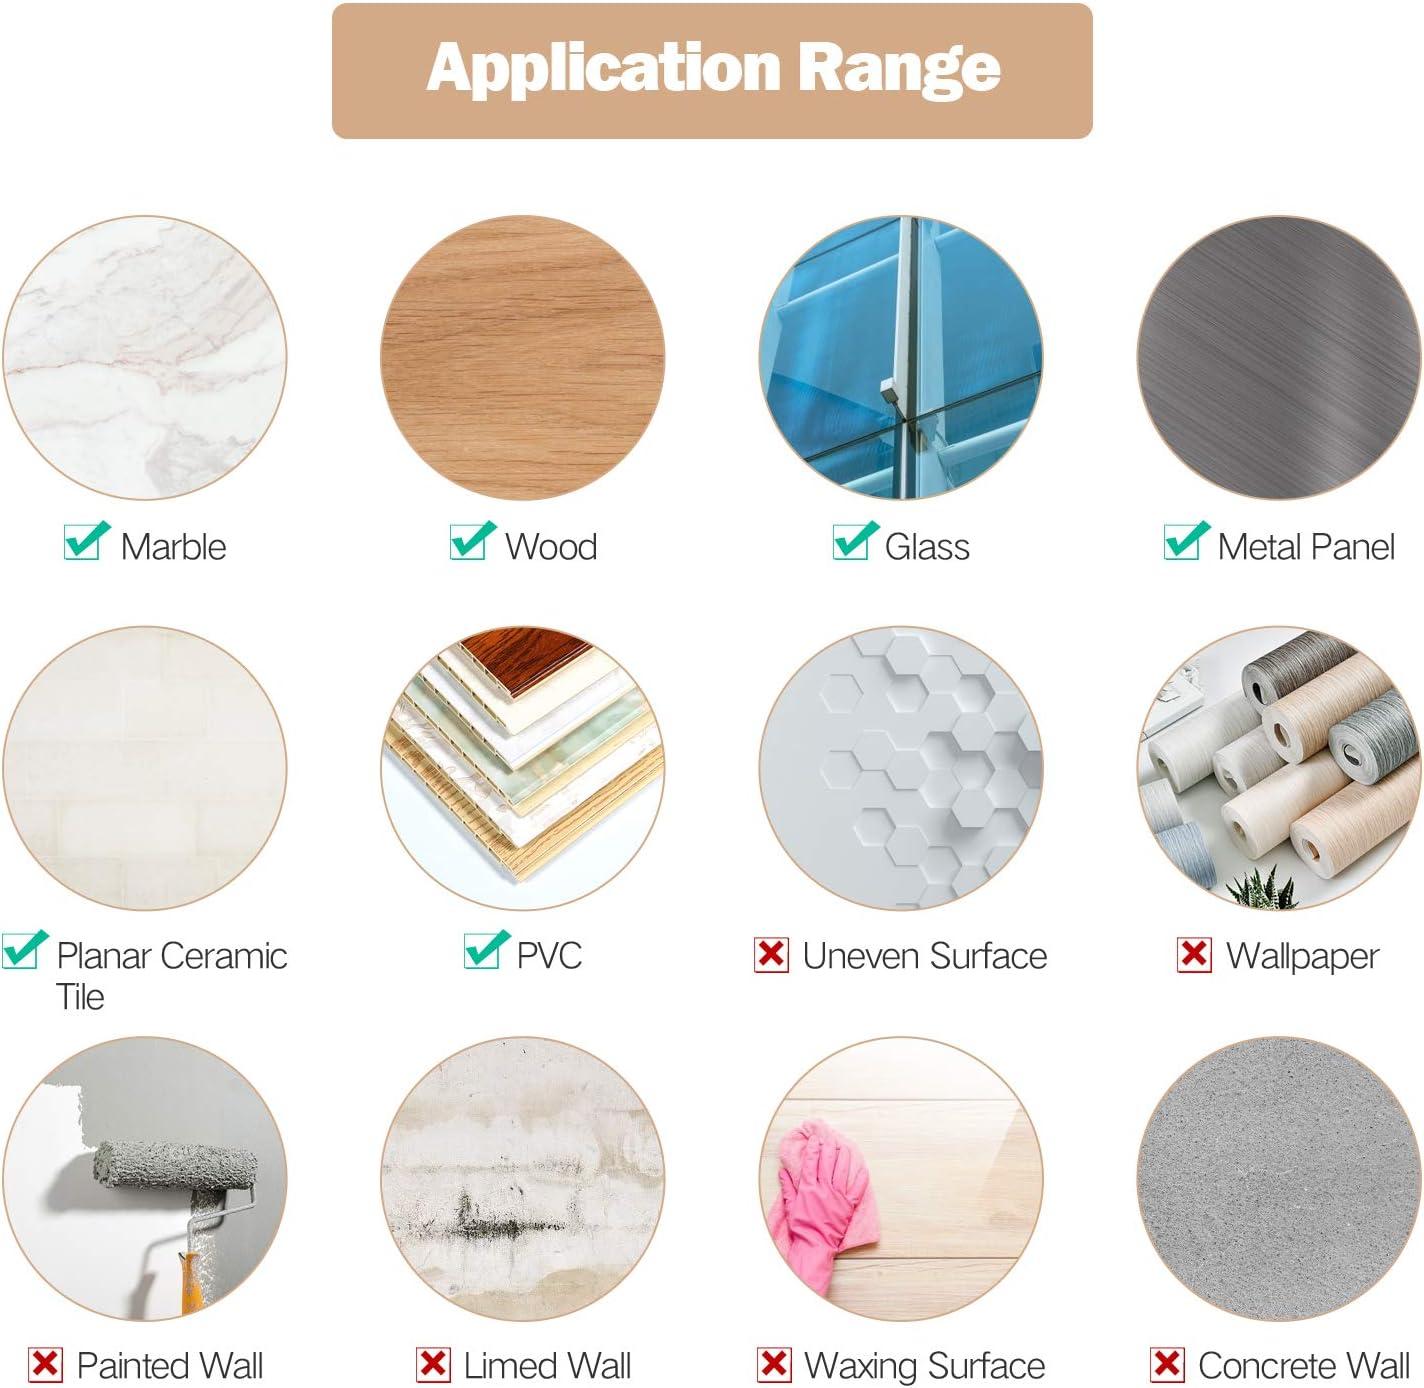 Essentials Bath Shower Caddy UMI and Soap Conditioner Bath Organiser Kitchen Storage Basket for Shampoo set of 2 SUS 304 Stainless Steel Shower Accessory